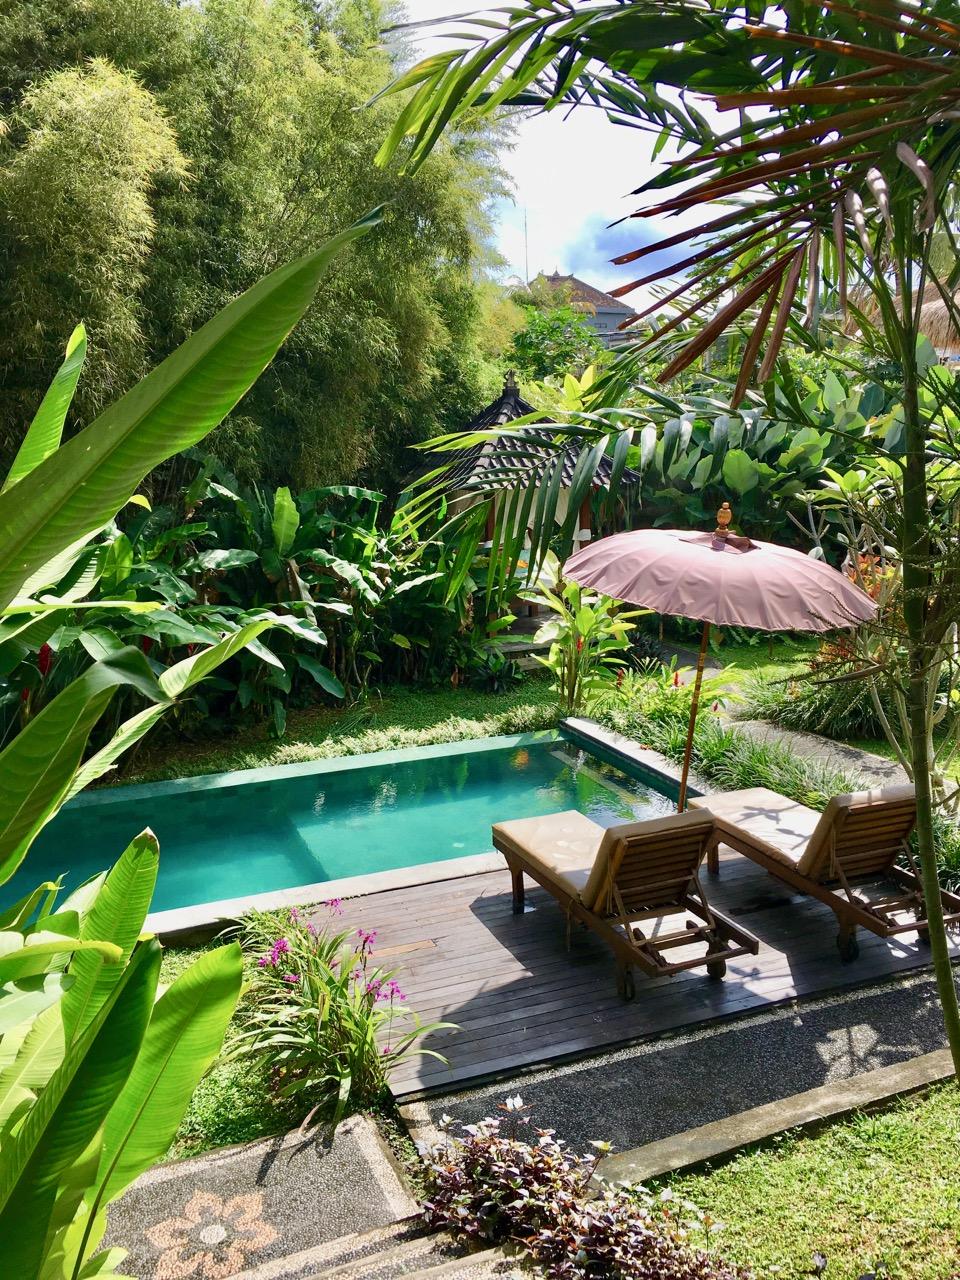 Hier am Pool in Ubud, Bali lässt es sich doch gut faulenzen....